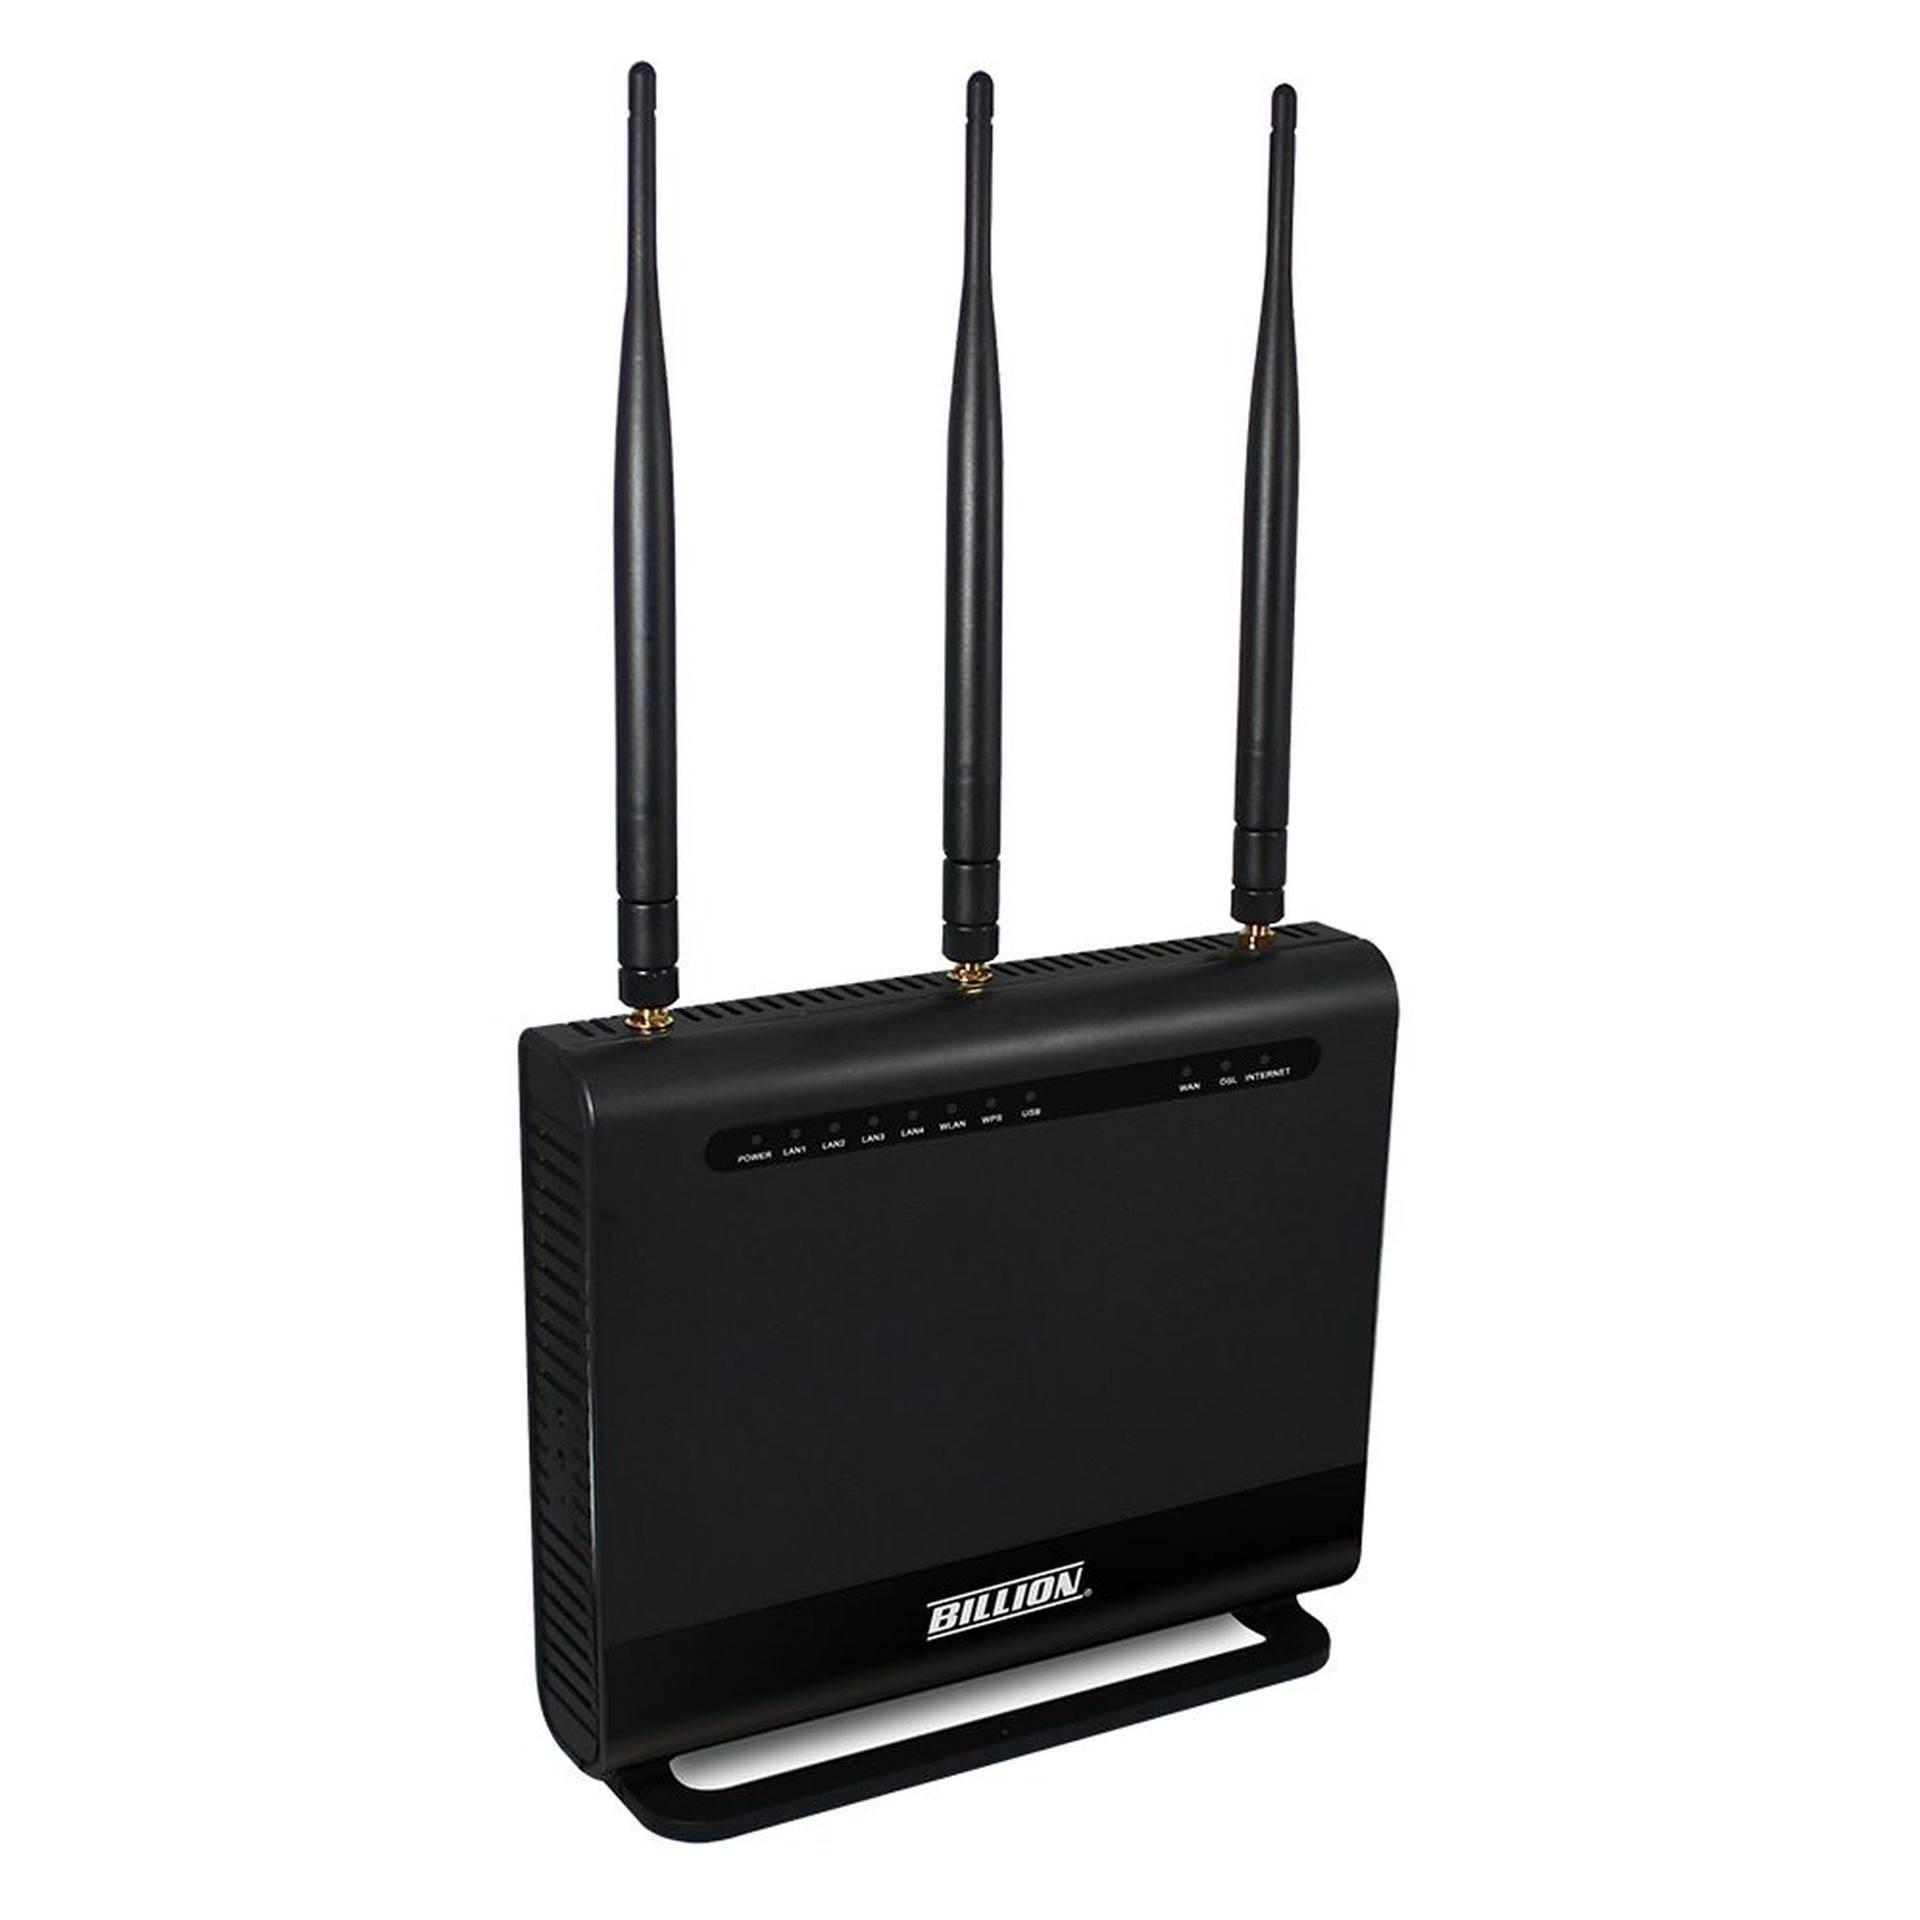 Review: Billion BiPAC 8700VAX–1600 VDSL2 Wi-Fi Router